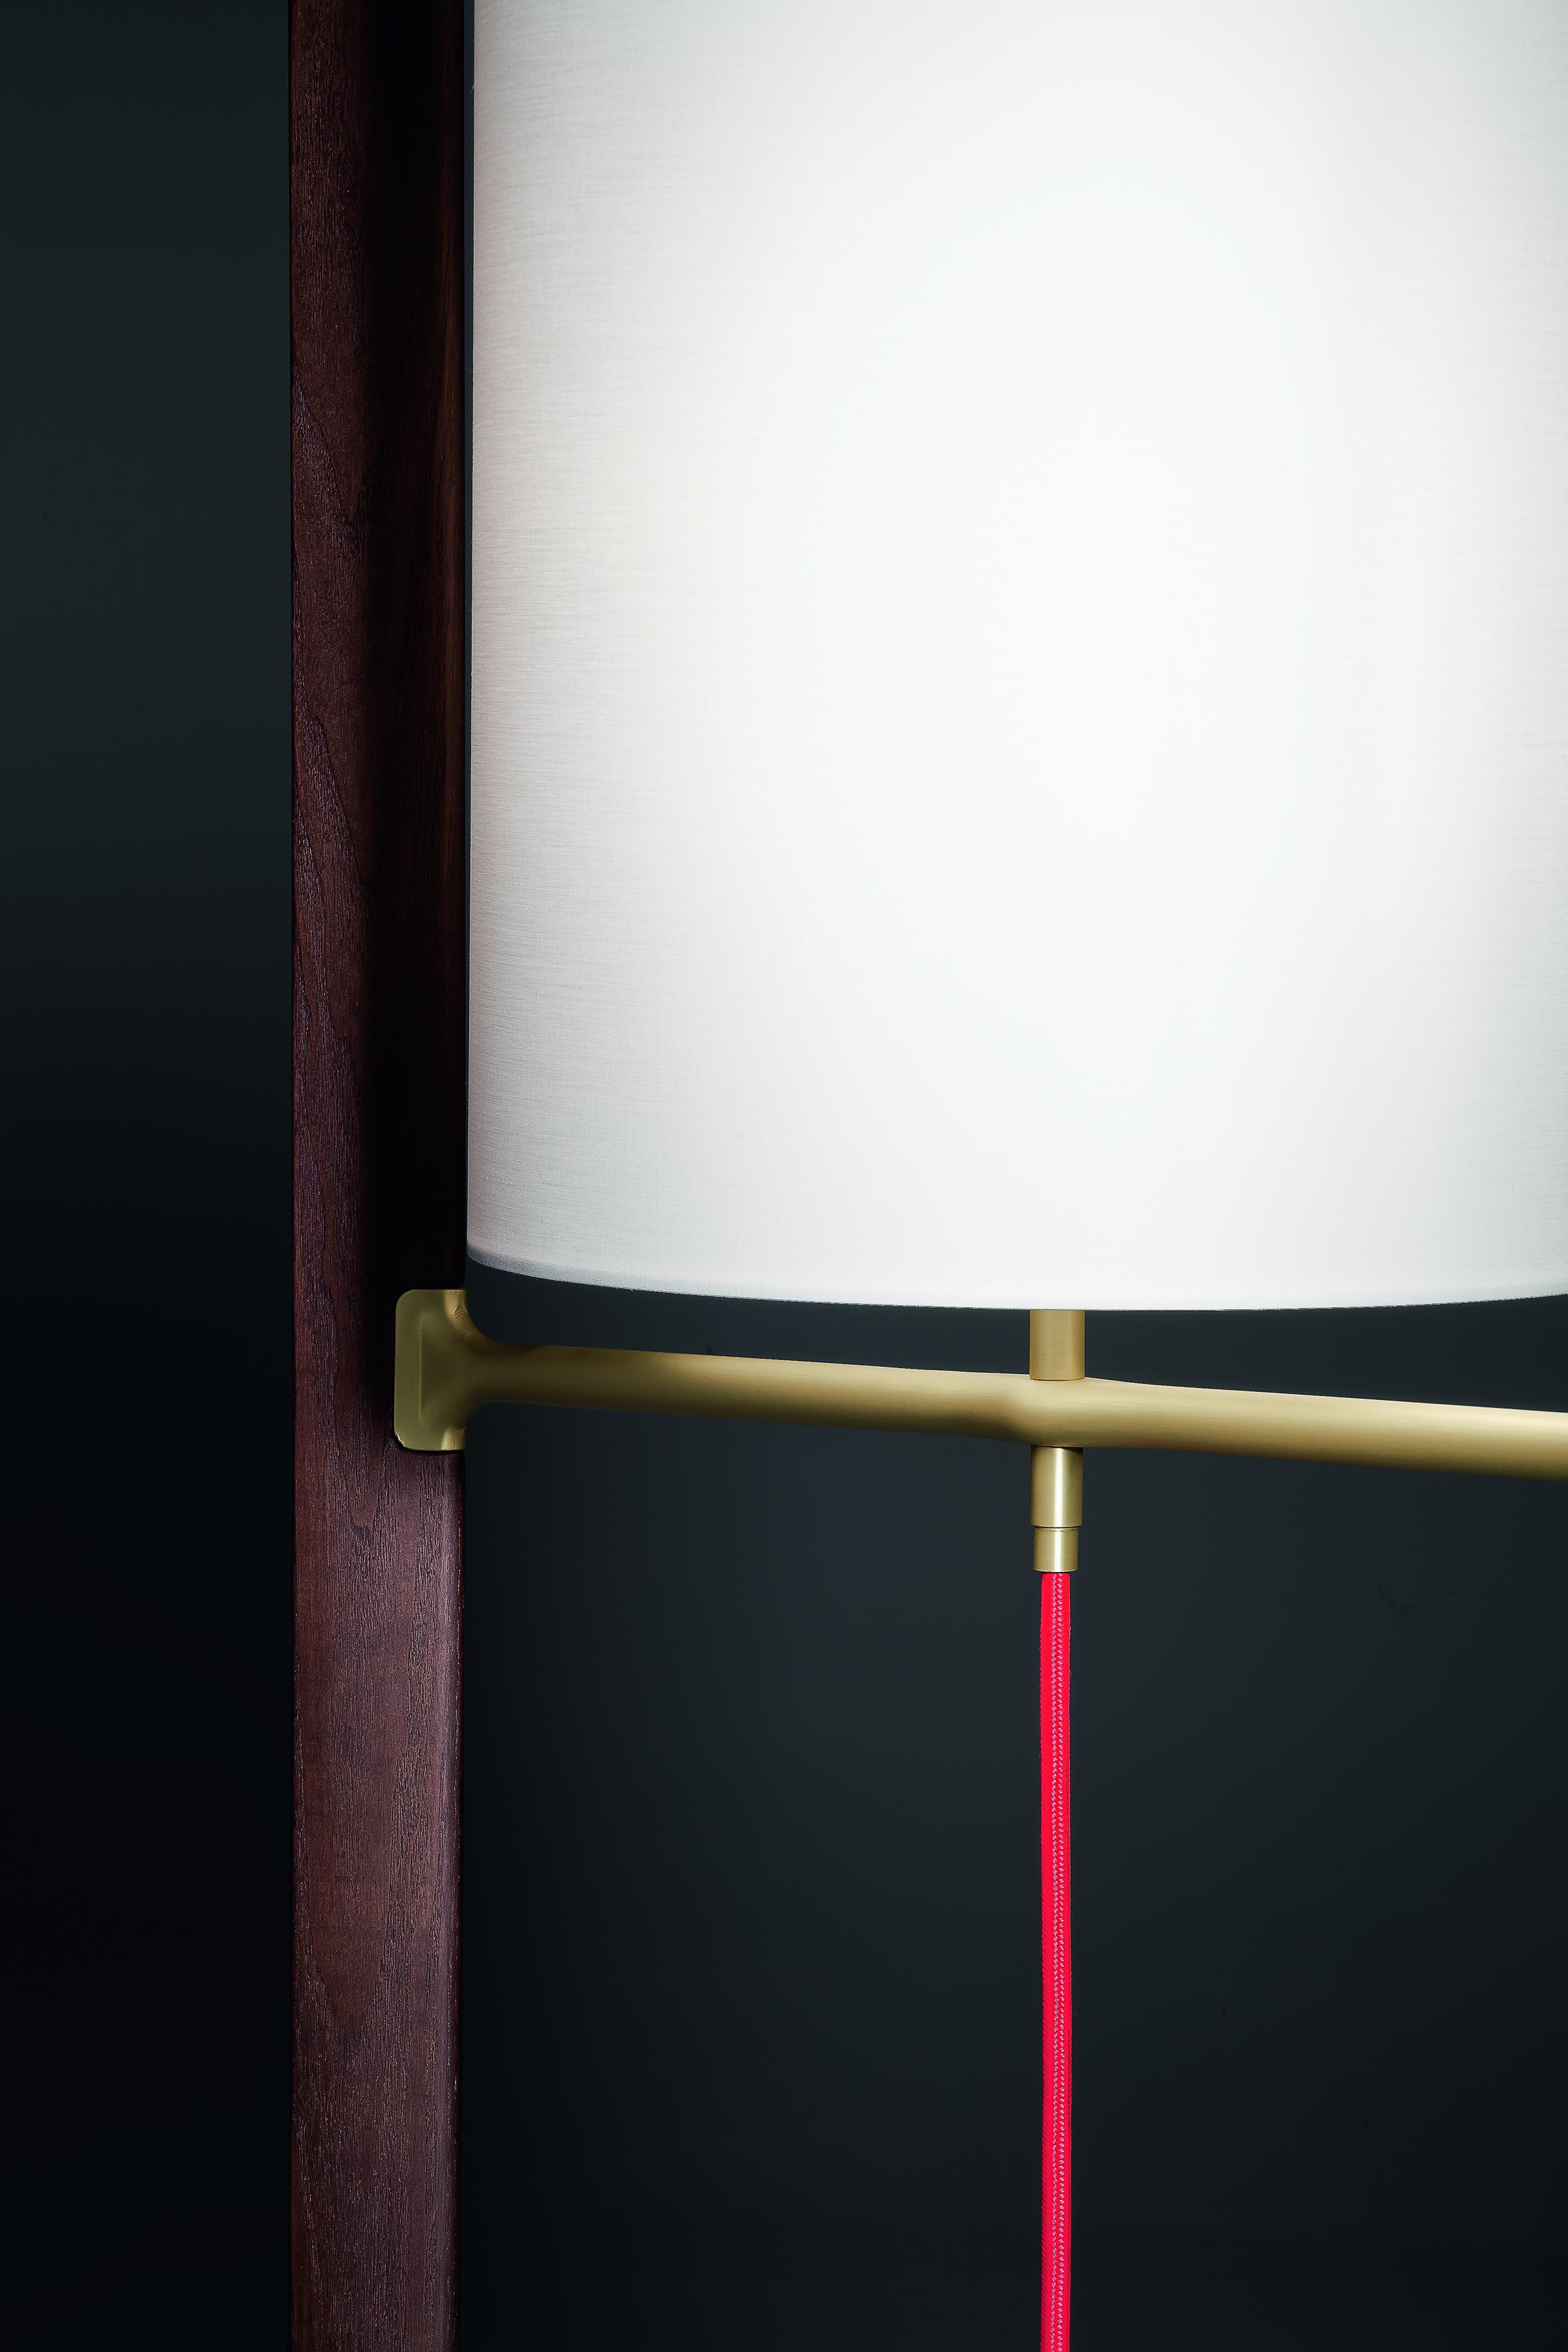 Fidelio Lamp by Poltrona Frau